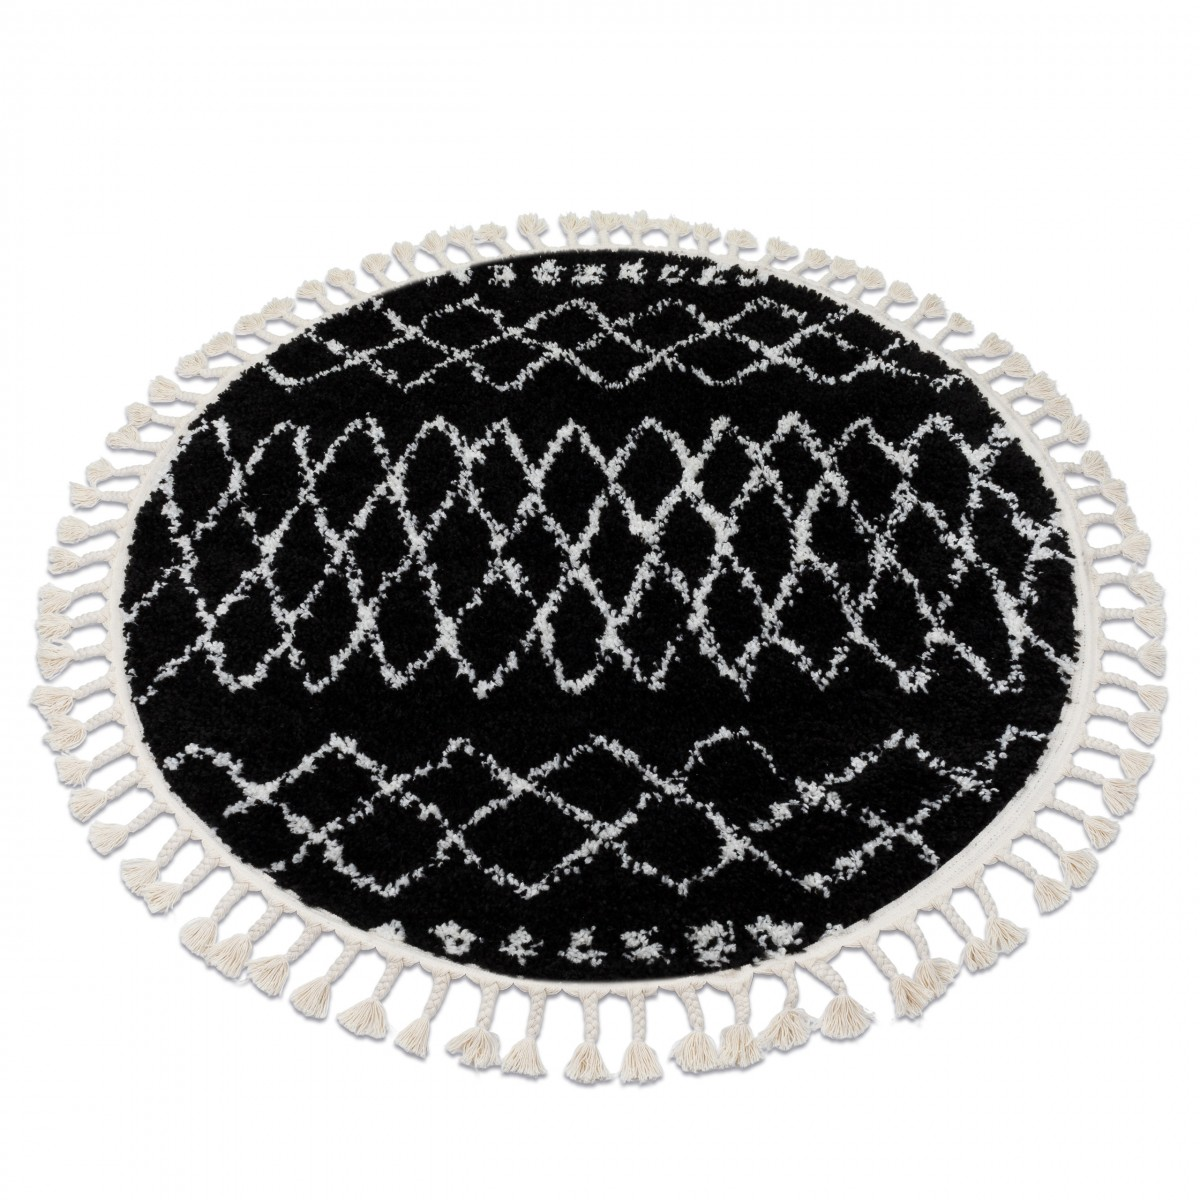 3kraft Kulatý shaggy koberec BERBER ETHNIC G3802 černý